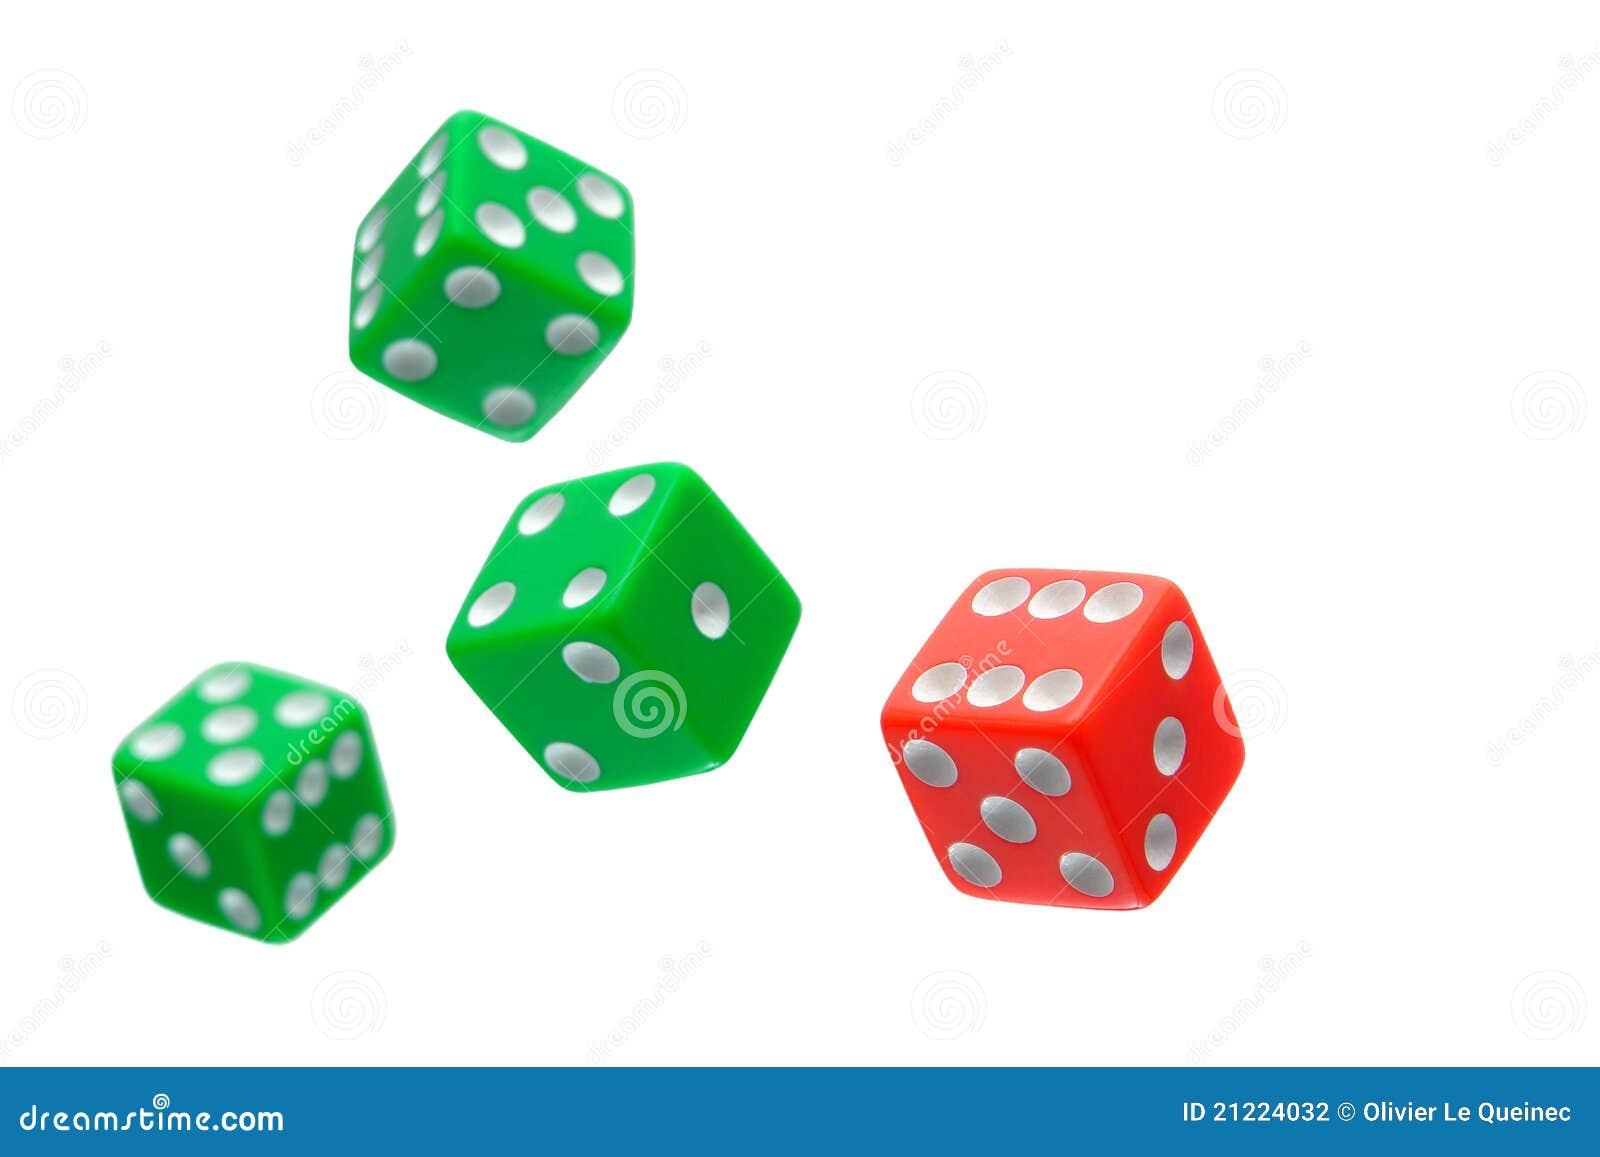 Odds of rolling dice craps